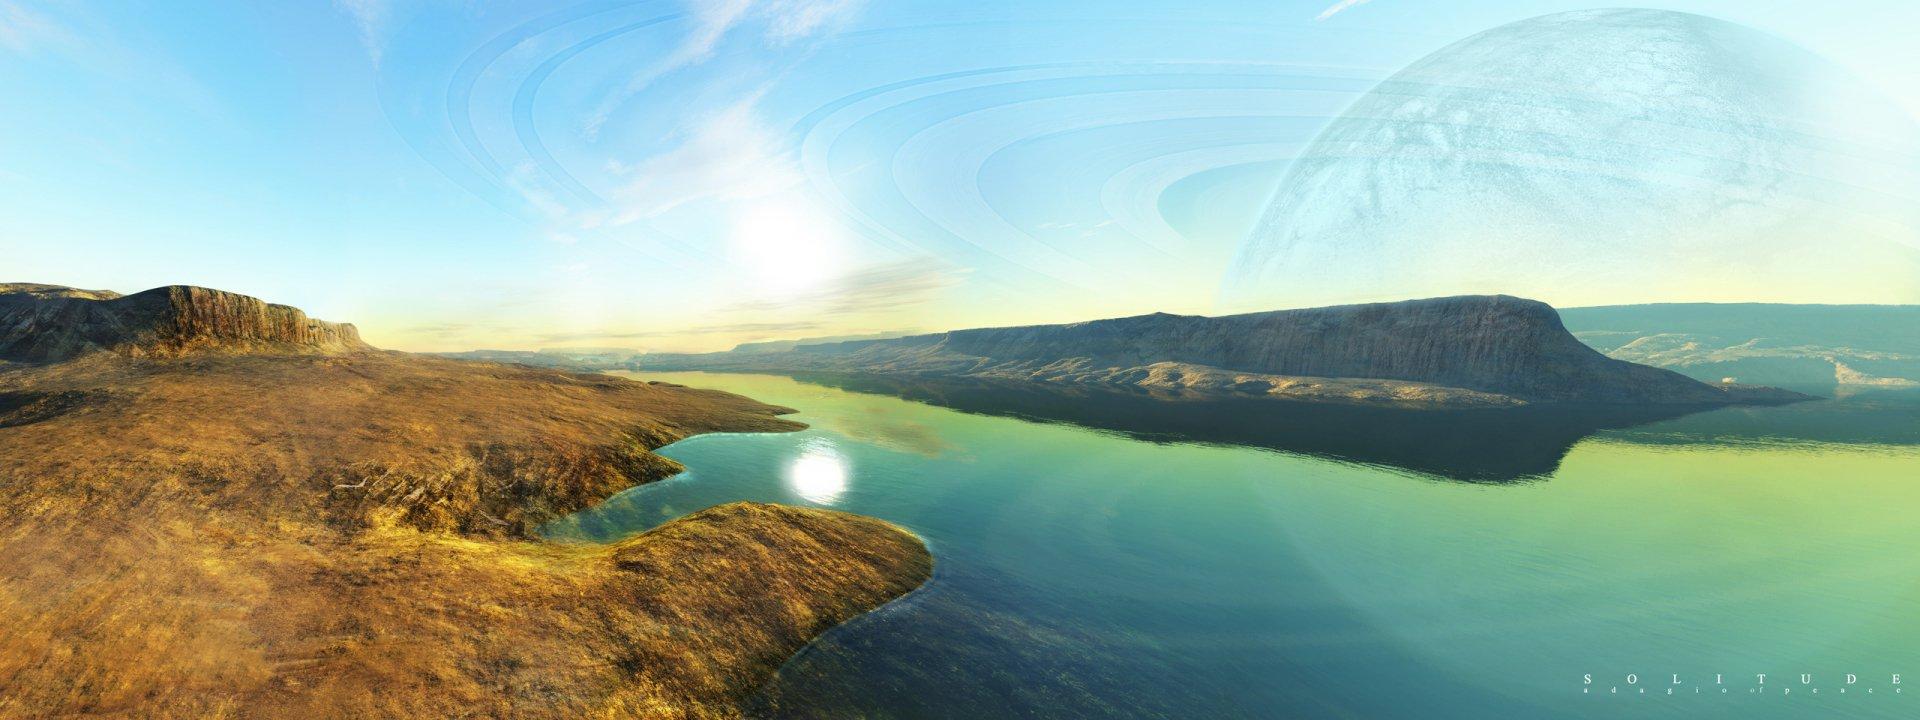 Multi Monitor - Erde/Natur  Ozean Planet Sonne Landschaft Wallpaper